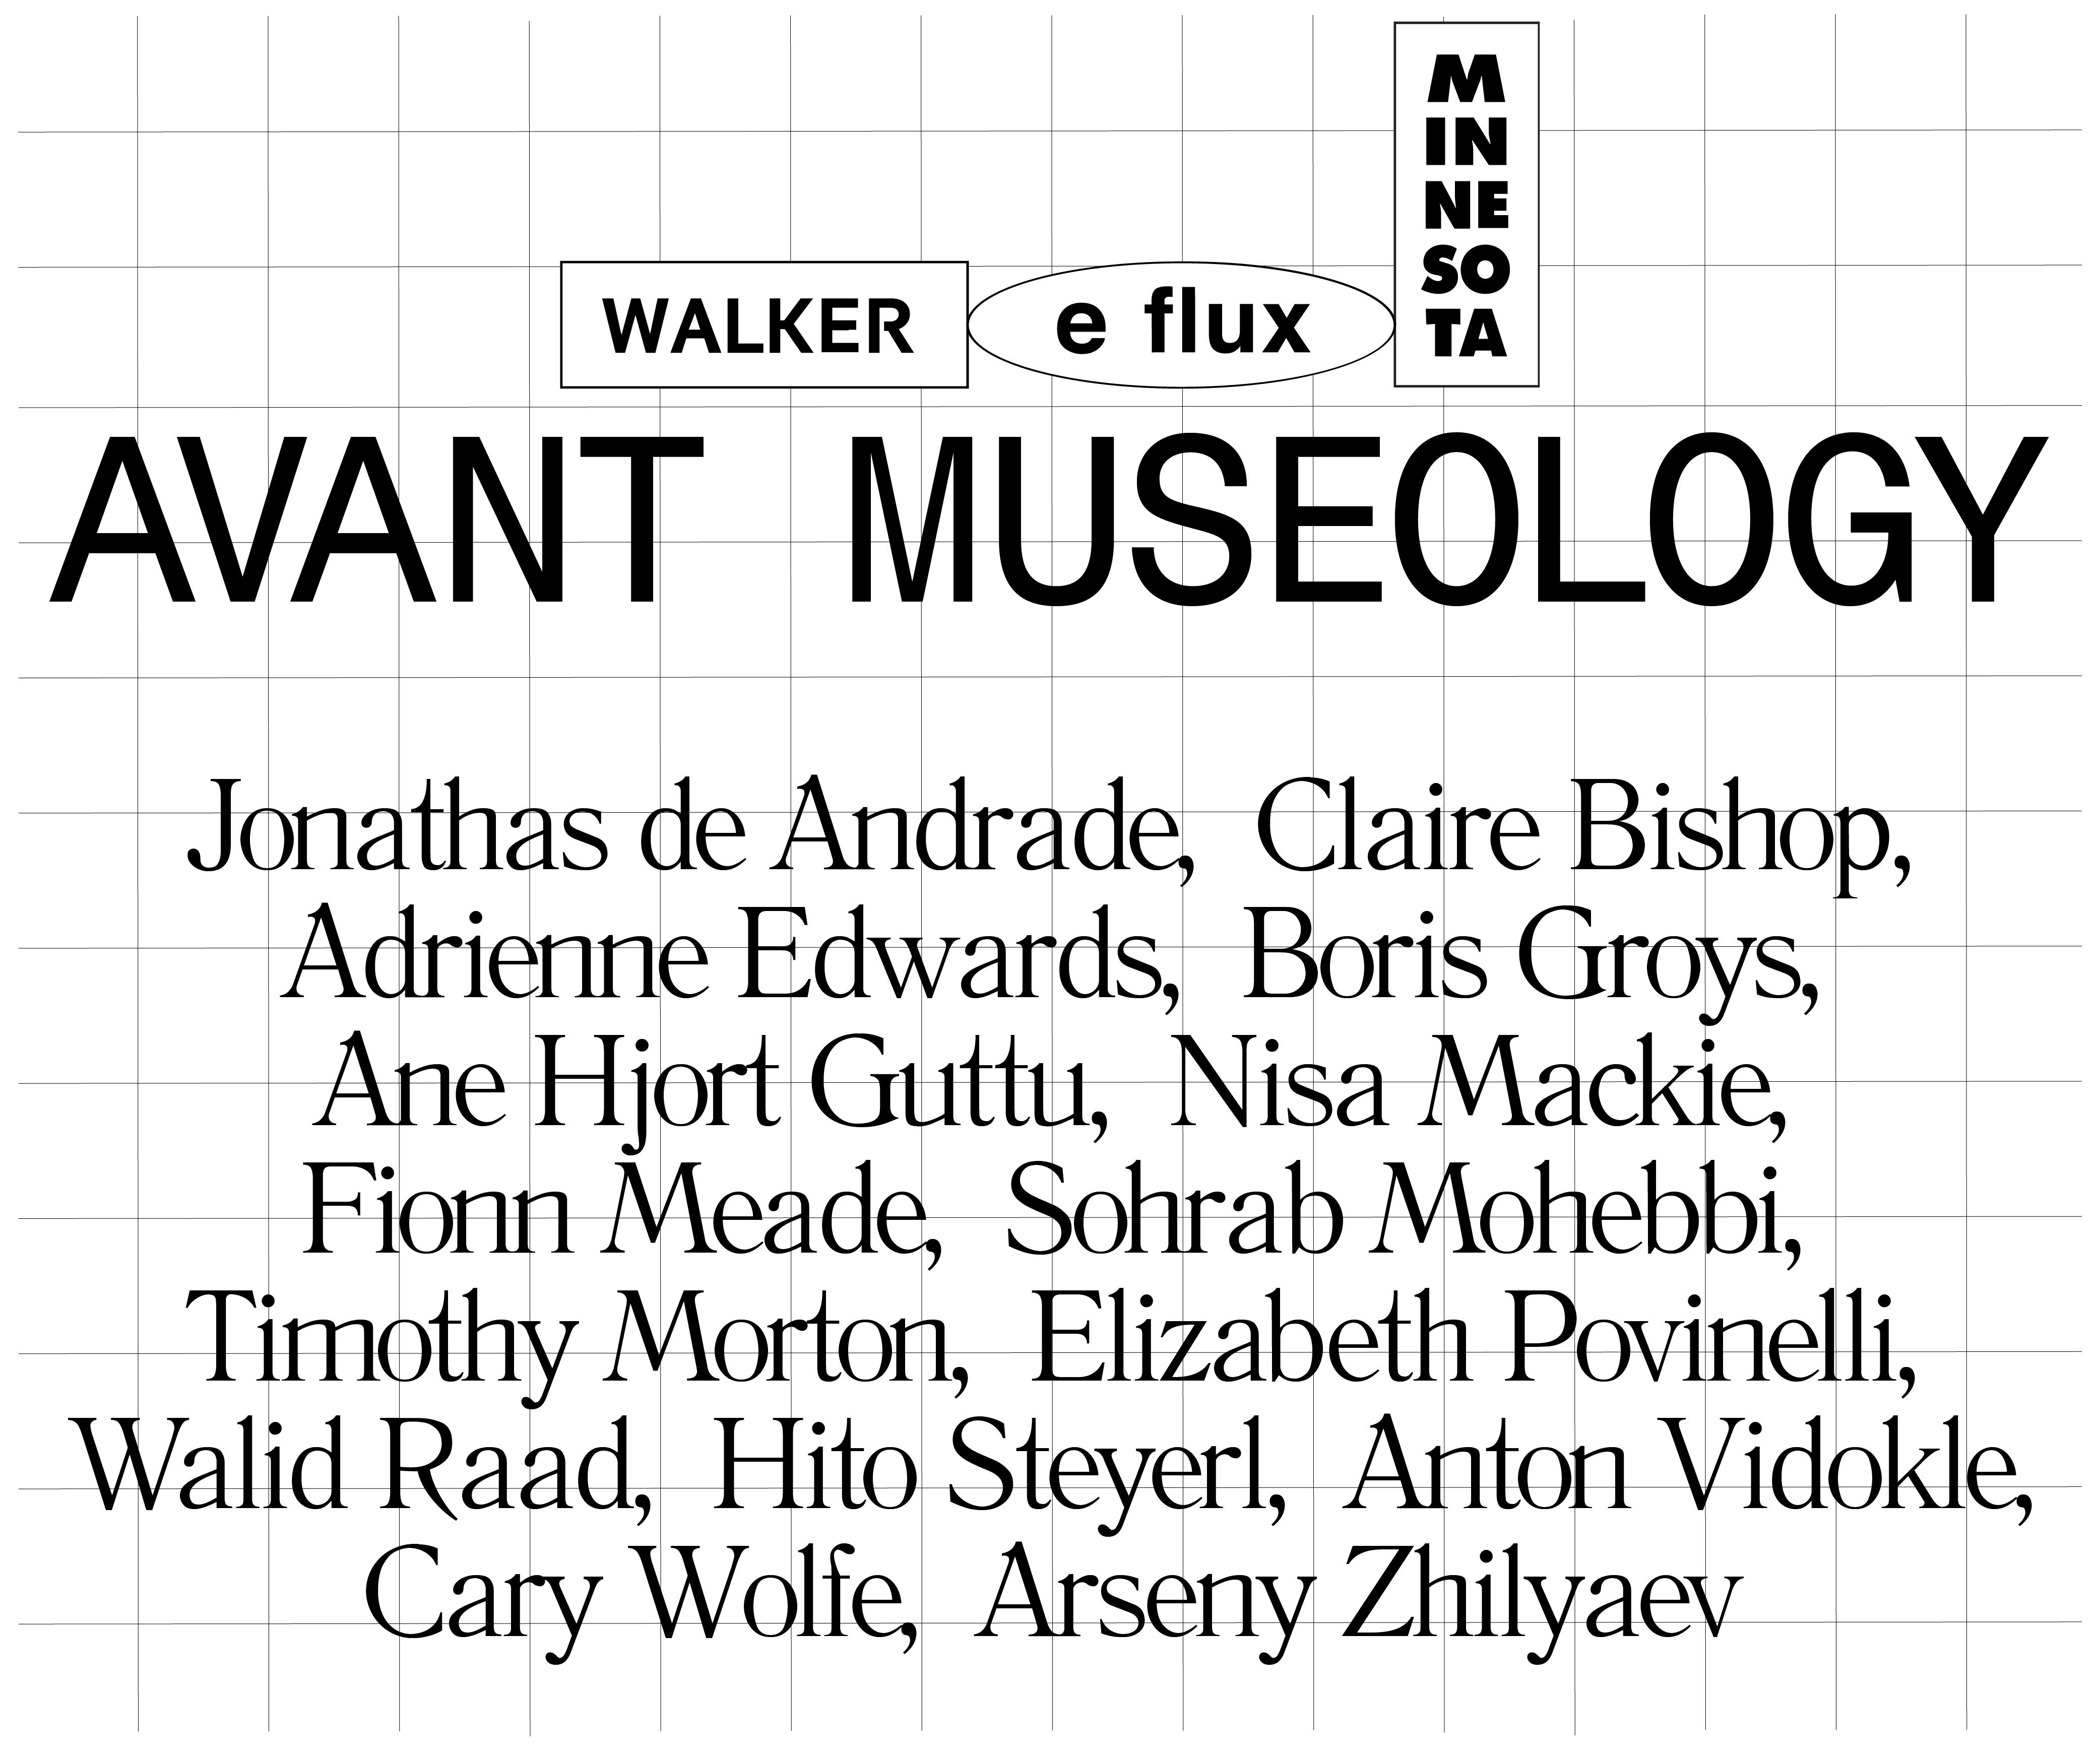 Avant Museology